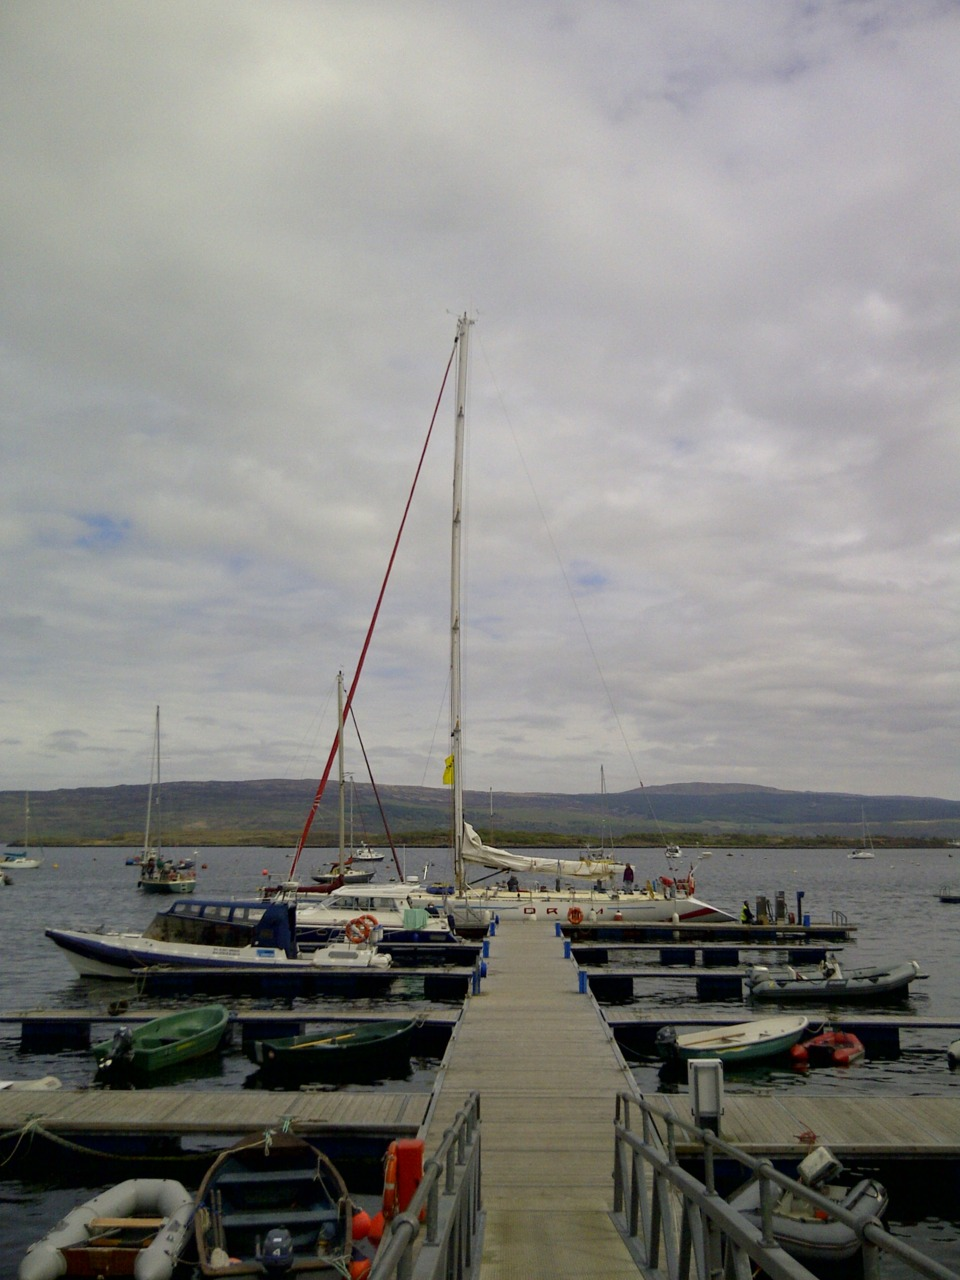 Rannochmor & Yacht Drum in Tobermory